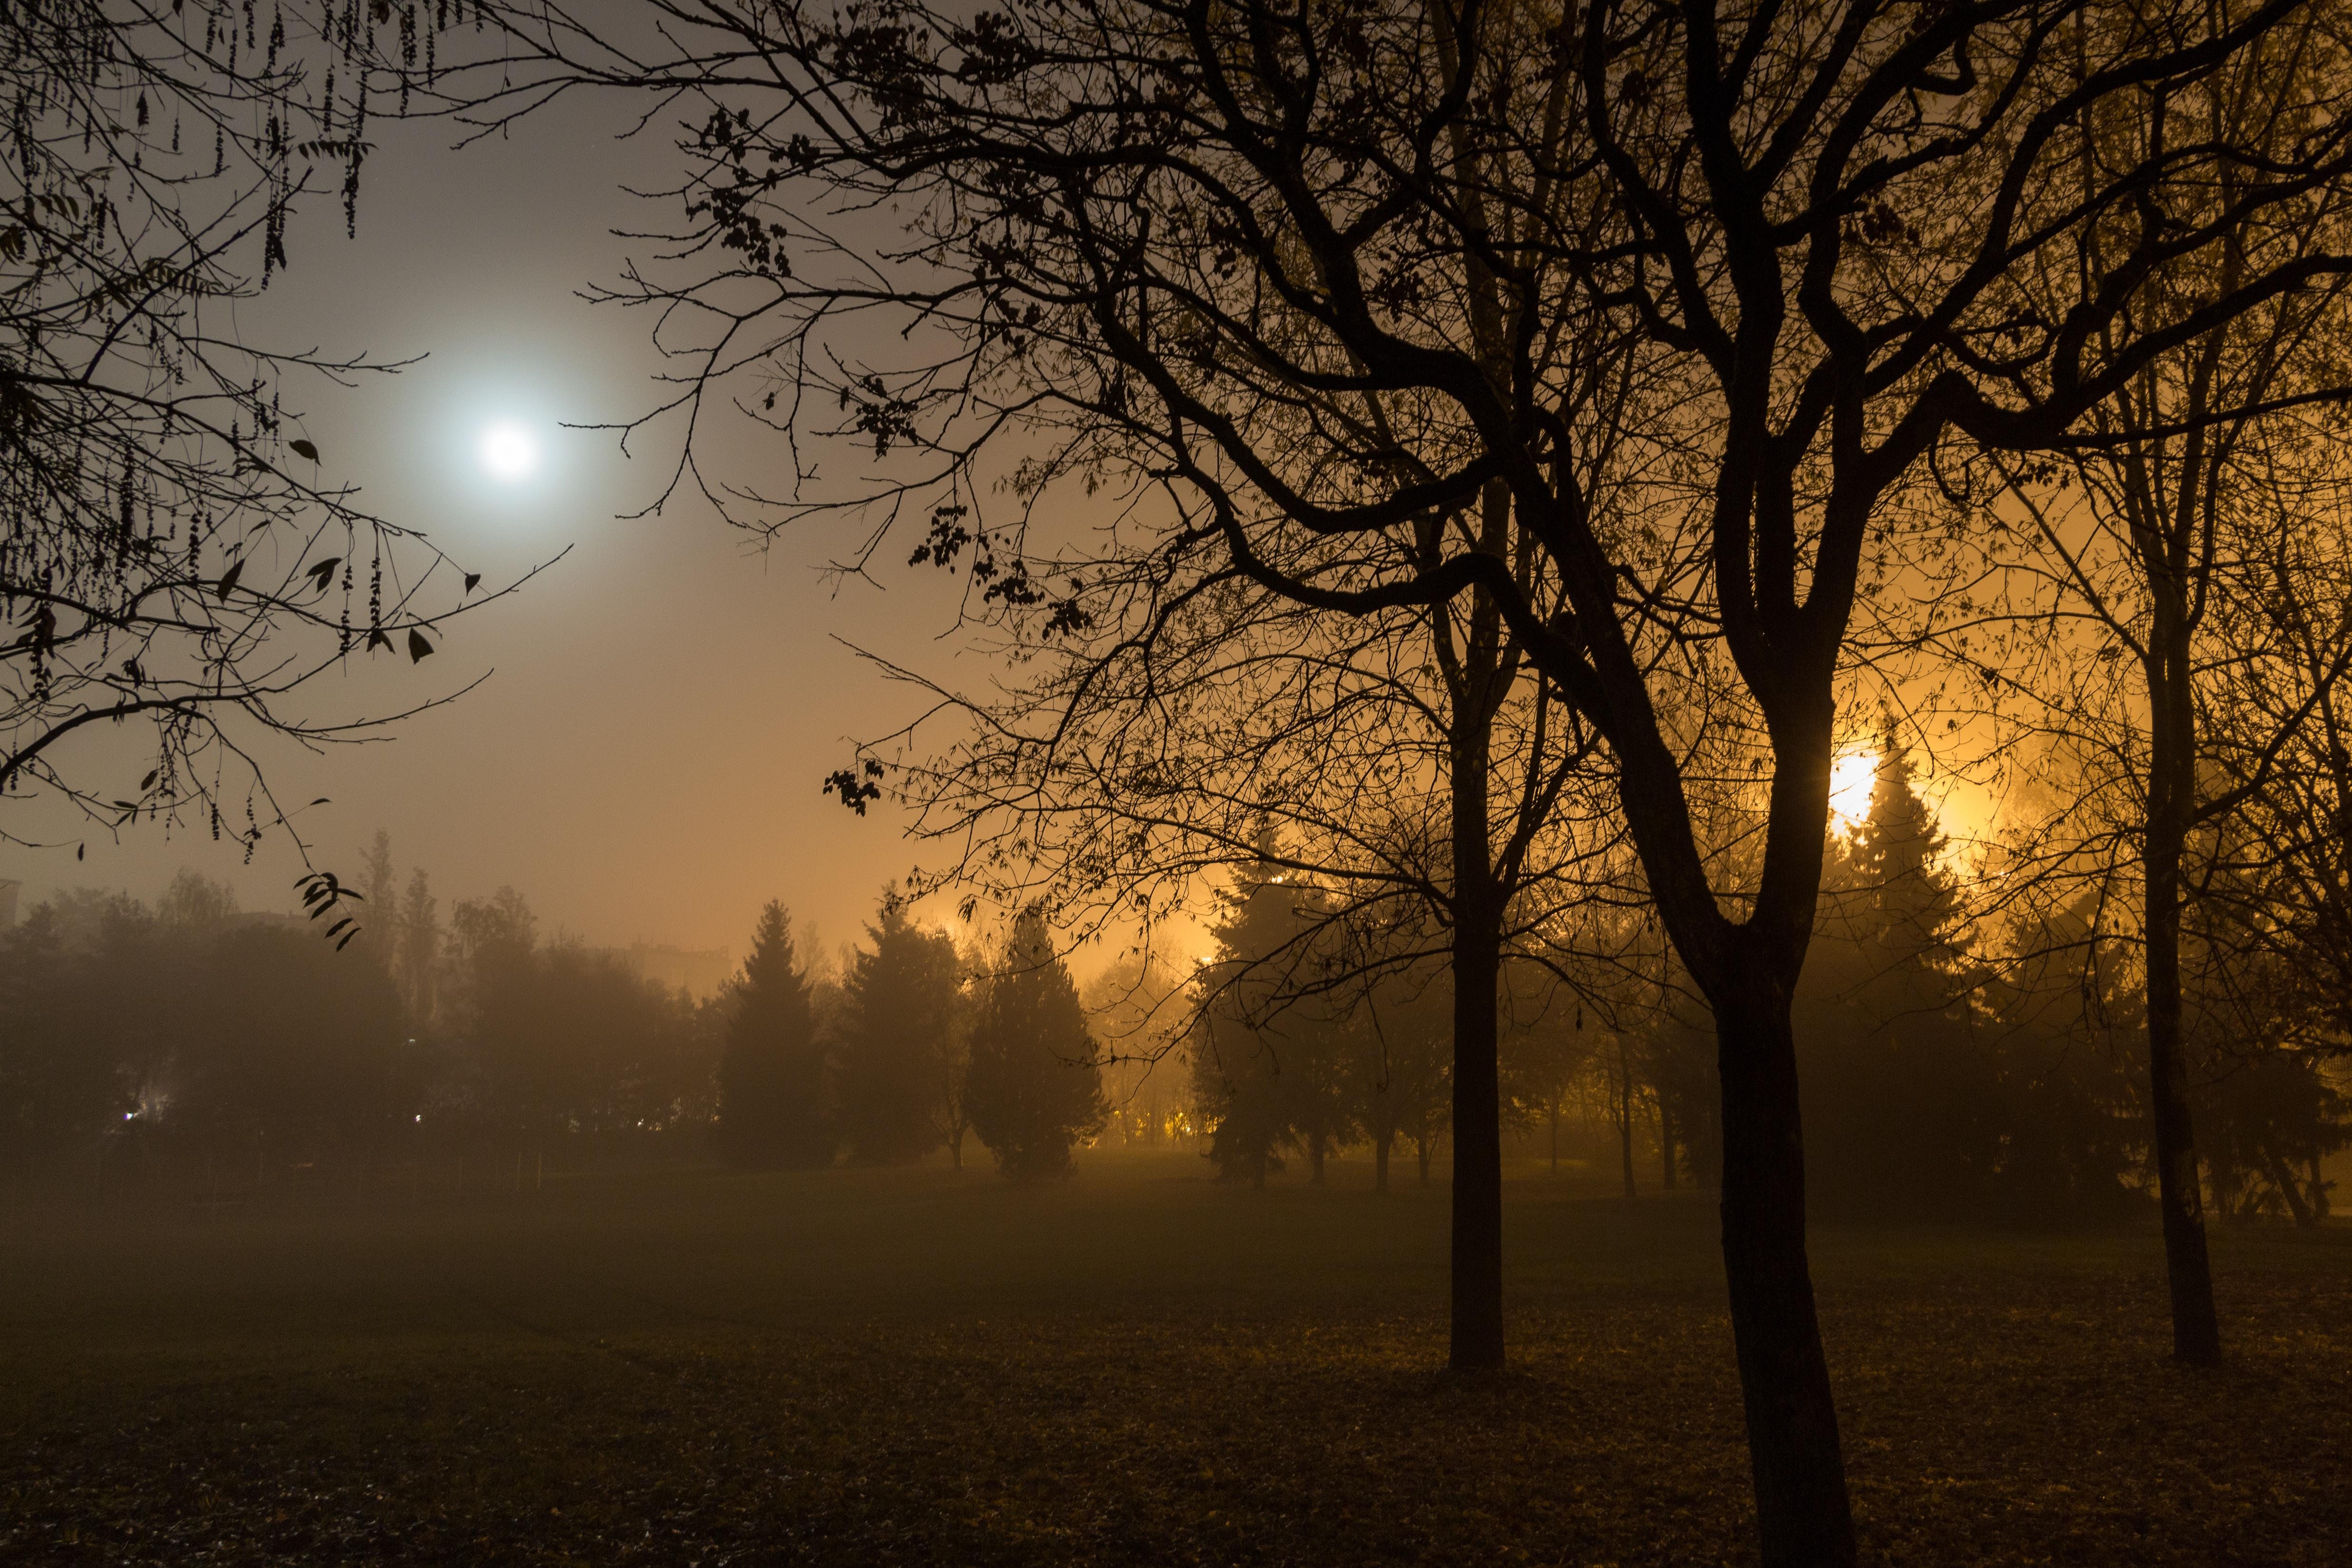 sun fog sunrise trees - photo #19